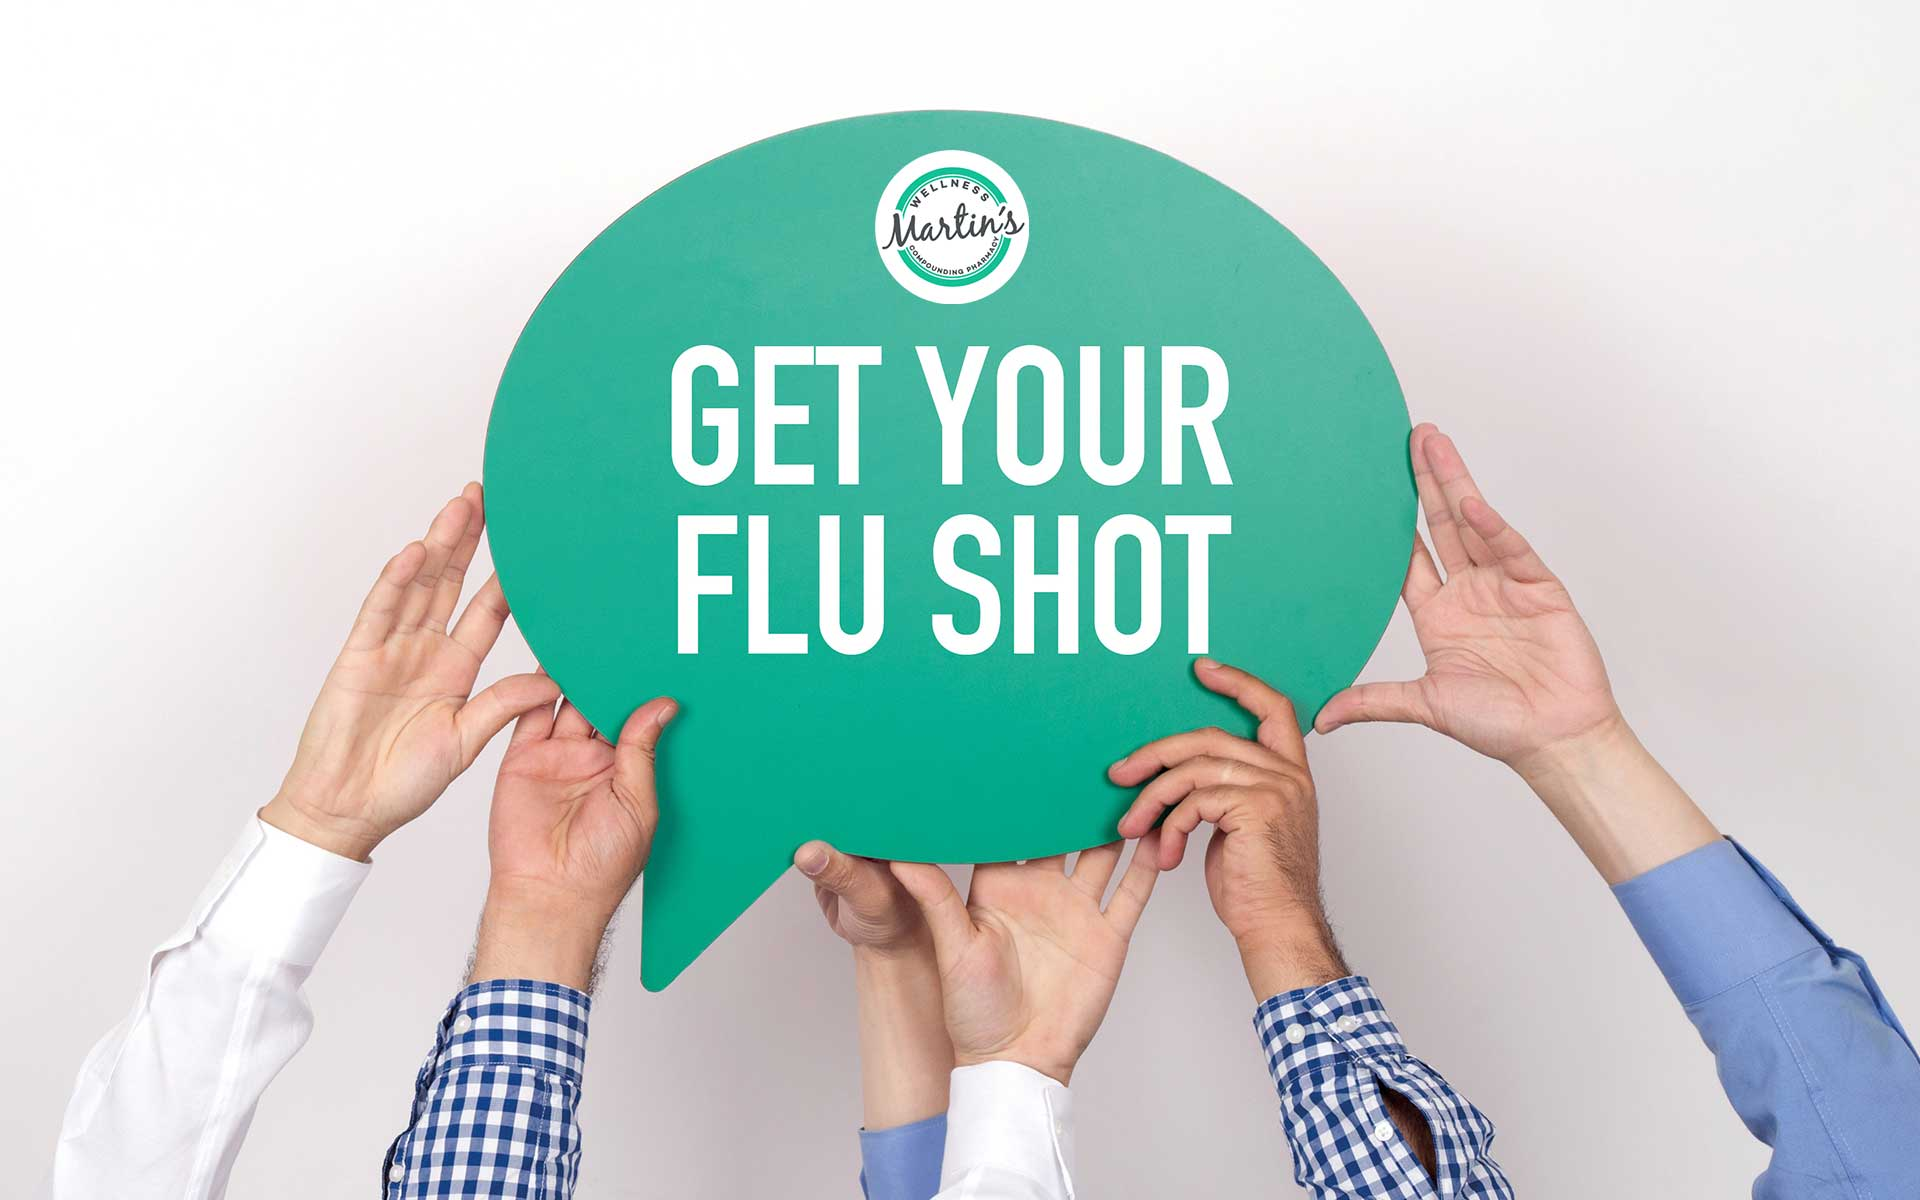 Get Your Flu Shot at Martin's Wellness